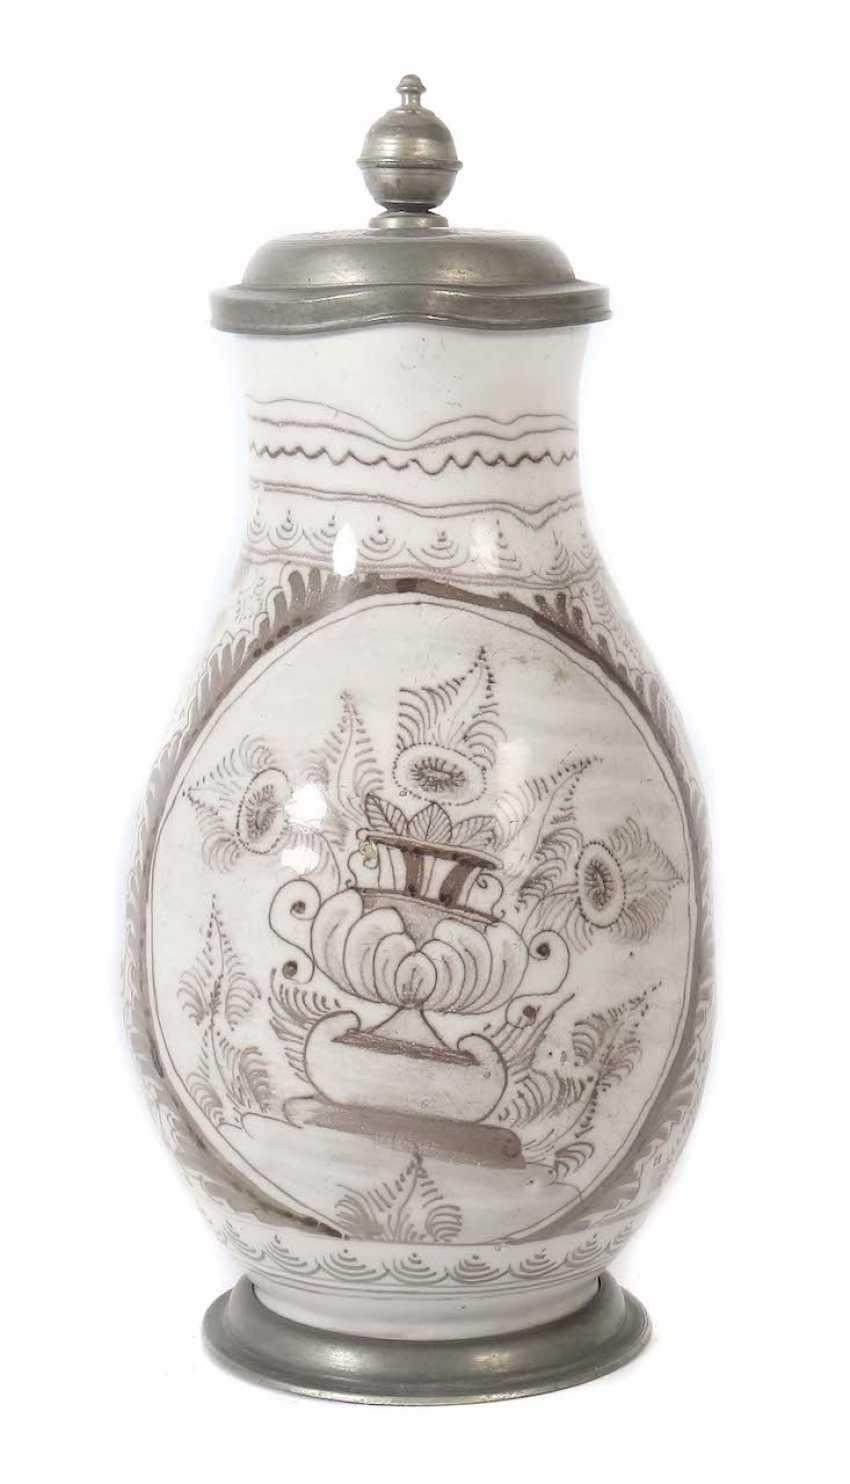 Birnkrug with vase painting 1. Half of 18. Century - photo 1